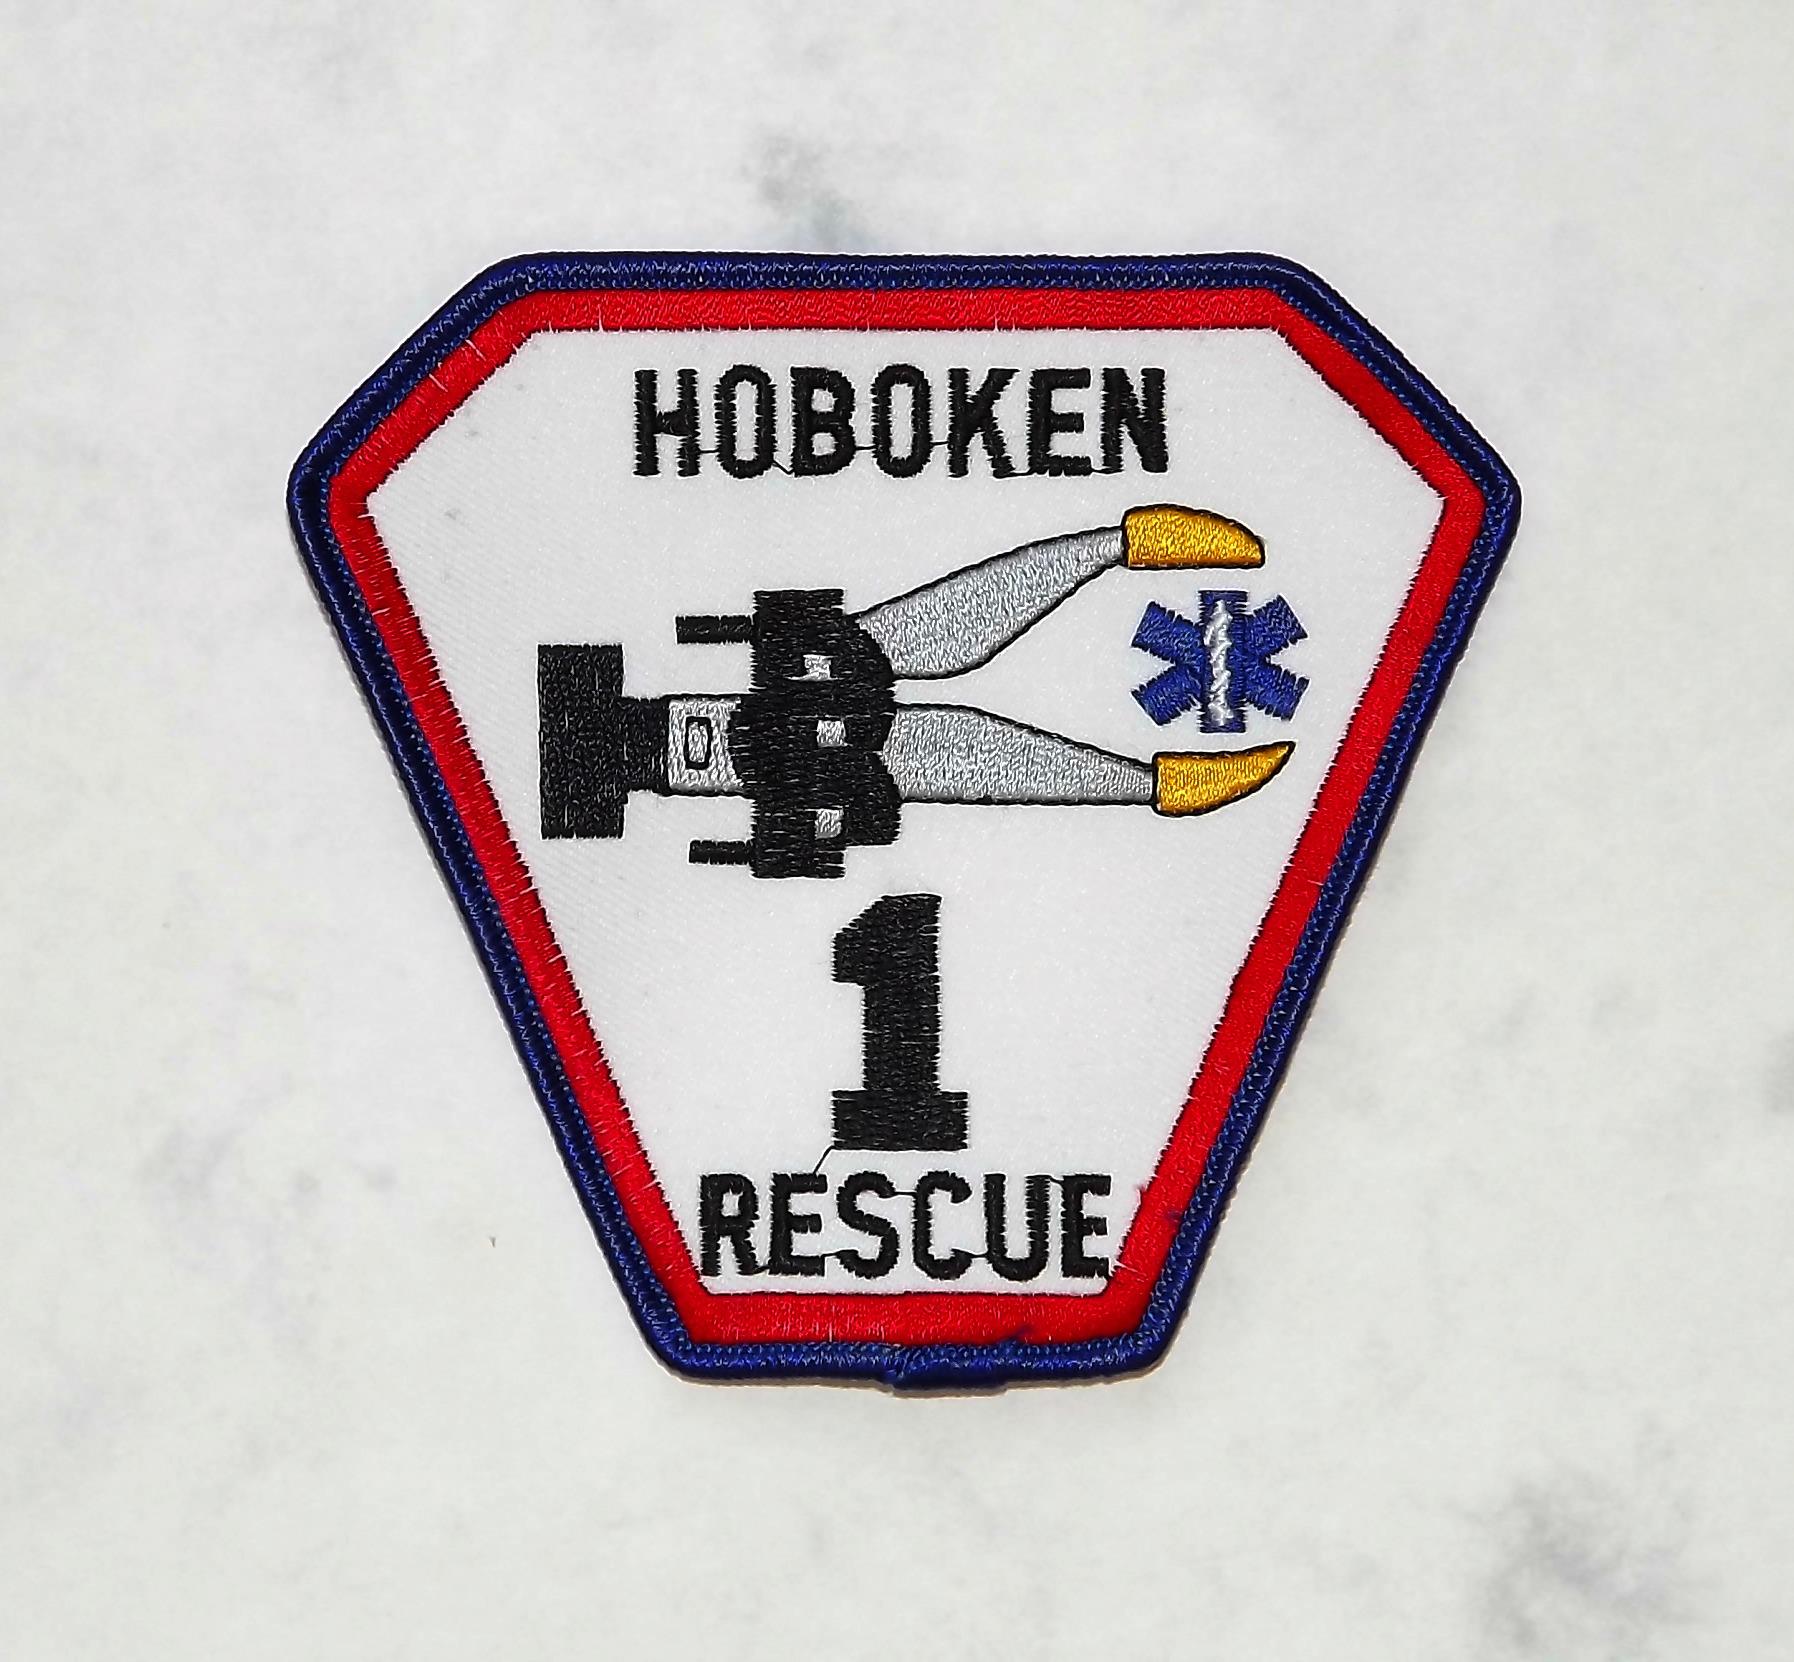 Hoboken Rescue 1